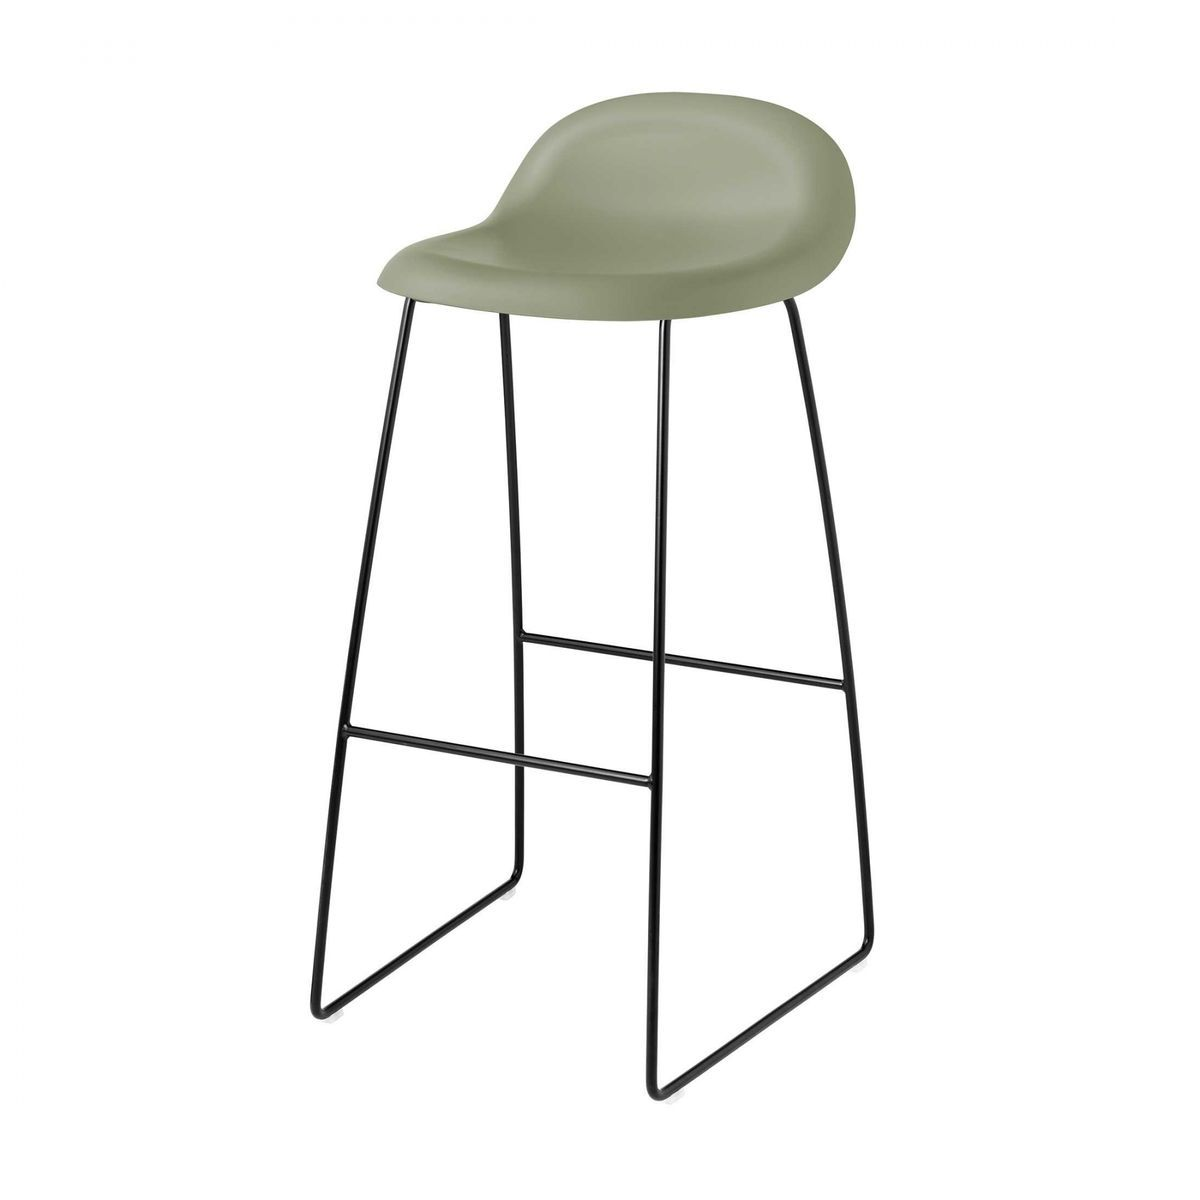 Gubi 3d bar stool kufengestell schwarz gubi for Barhocker 3d